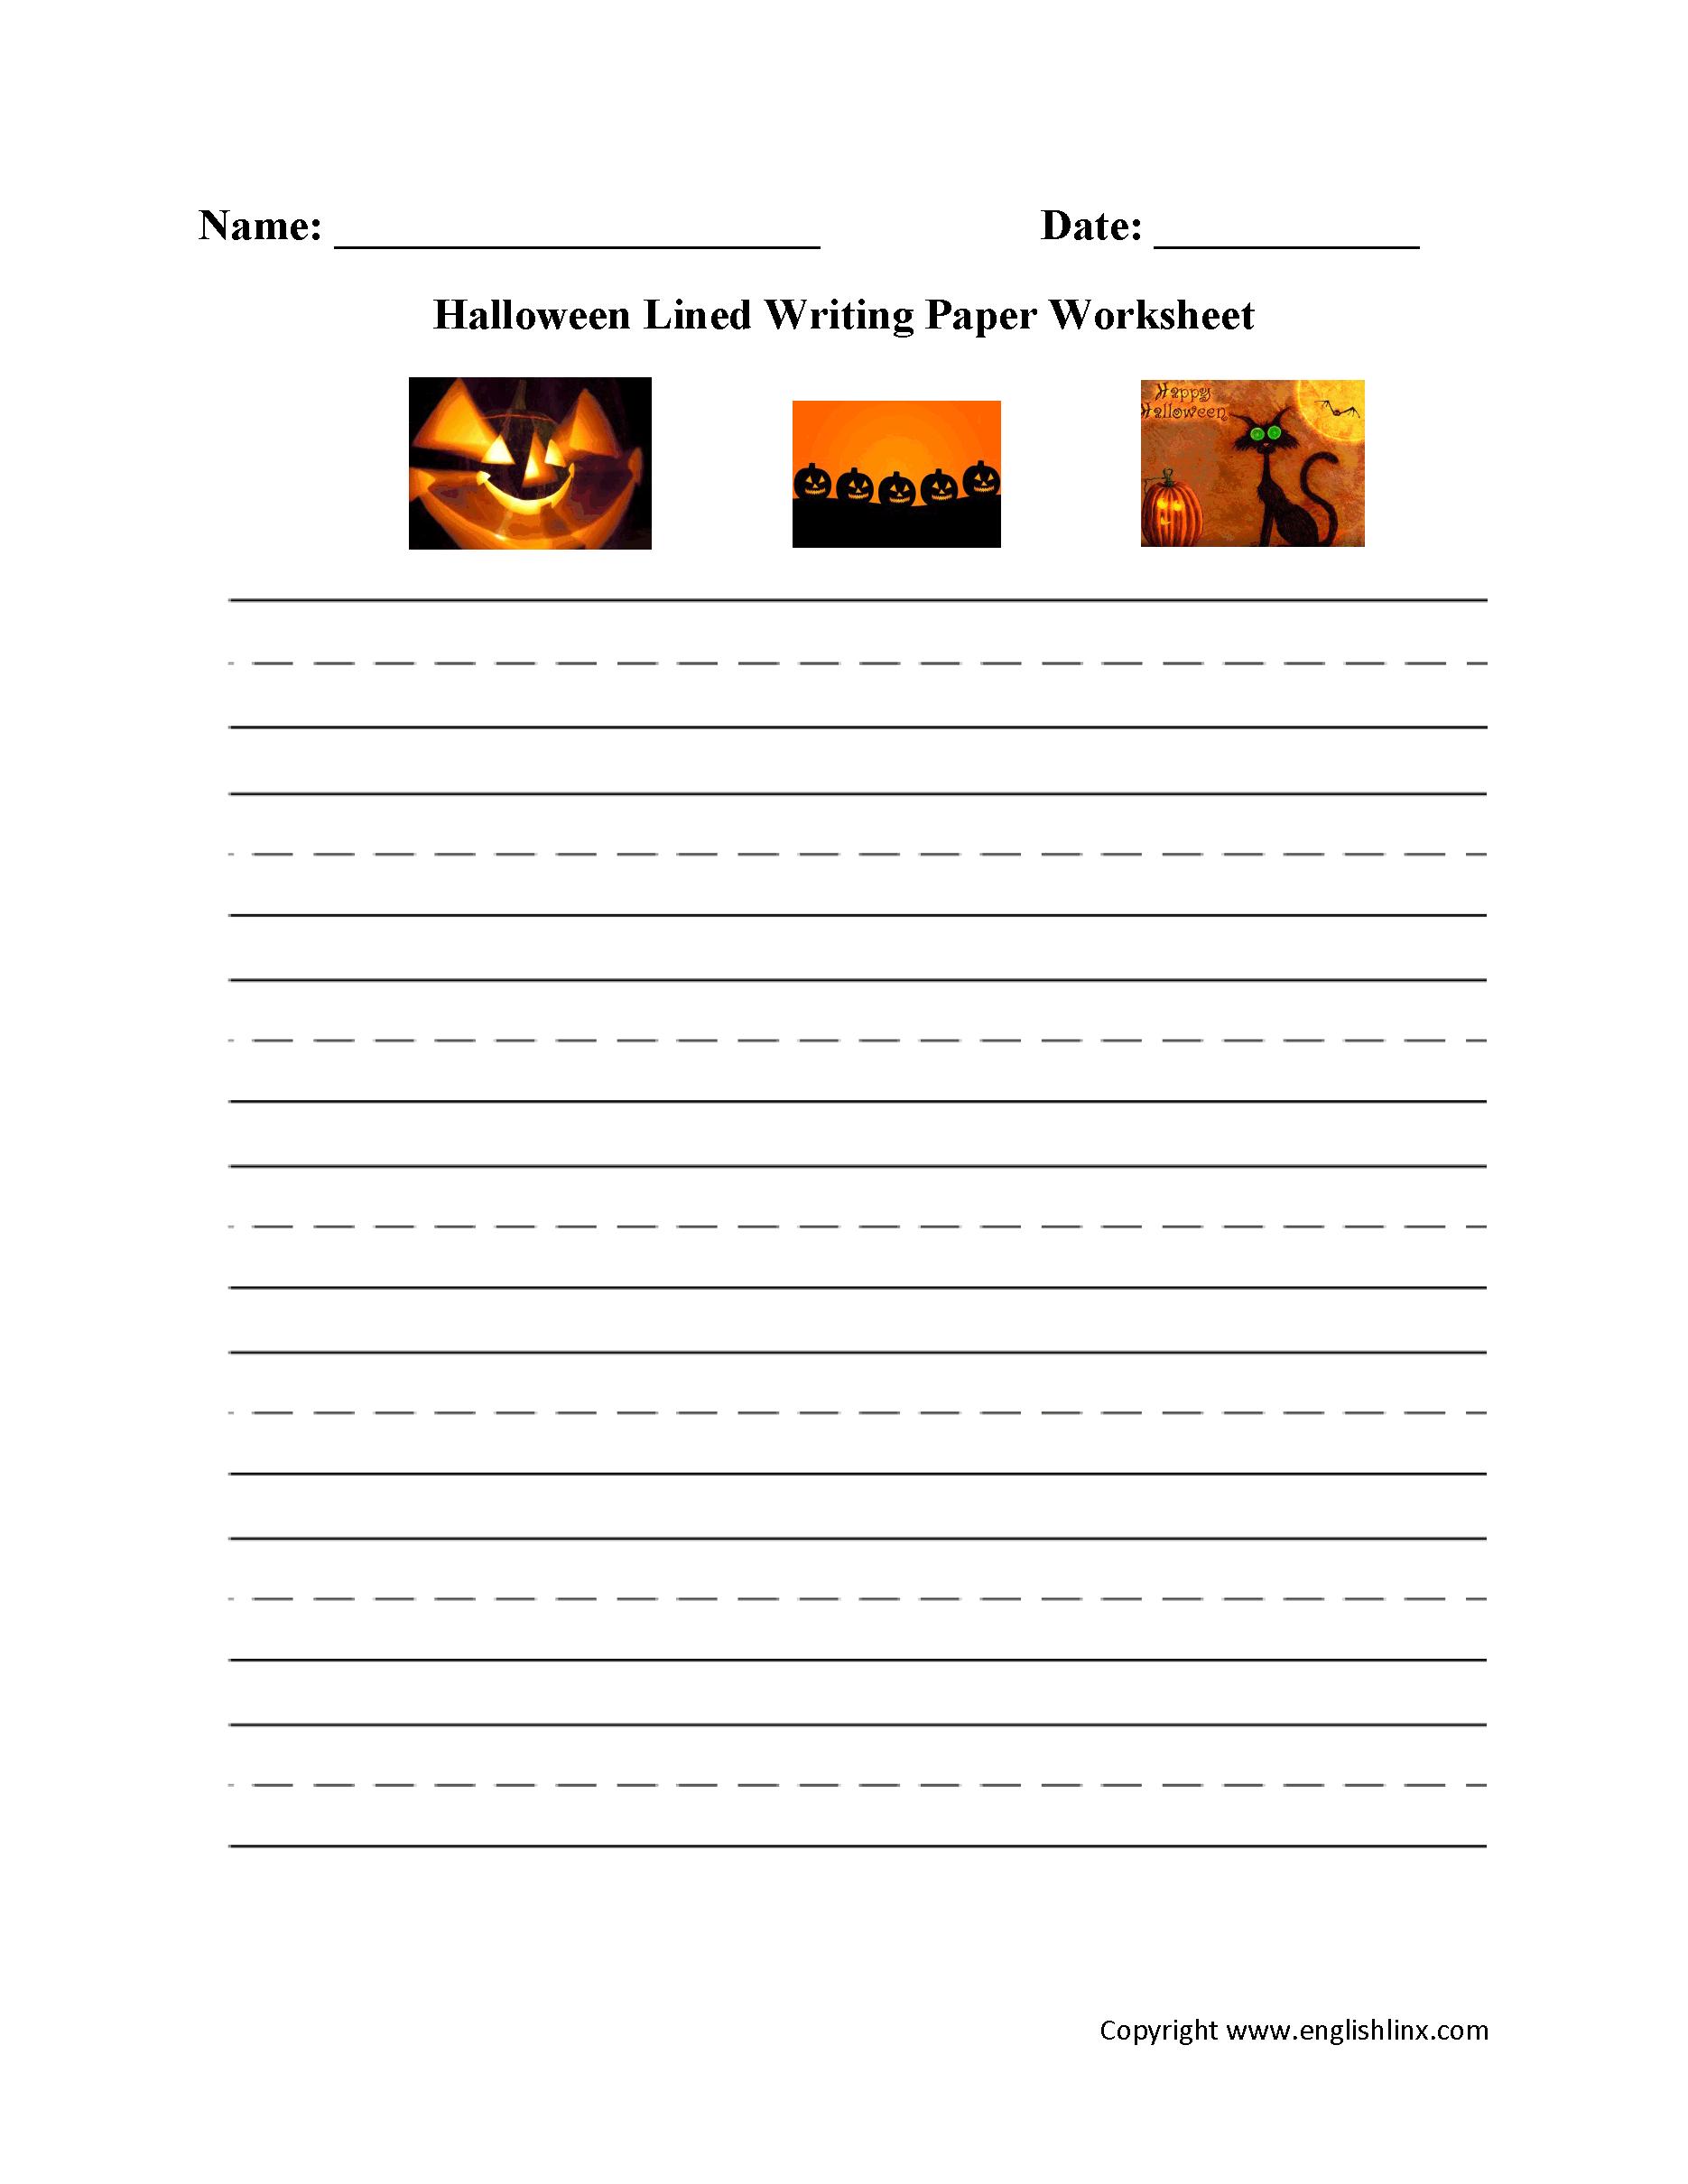 writing worksheets lined writing paper worksheets. Black Bedroom Furniture Sets. Home Design Ideas